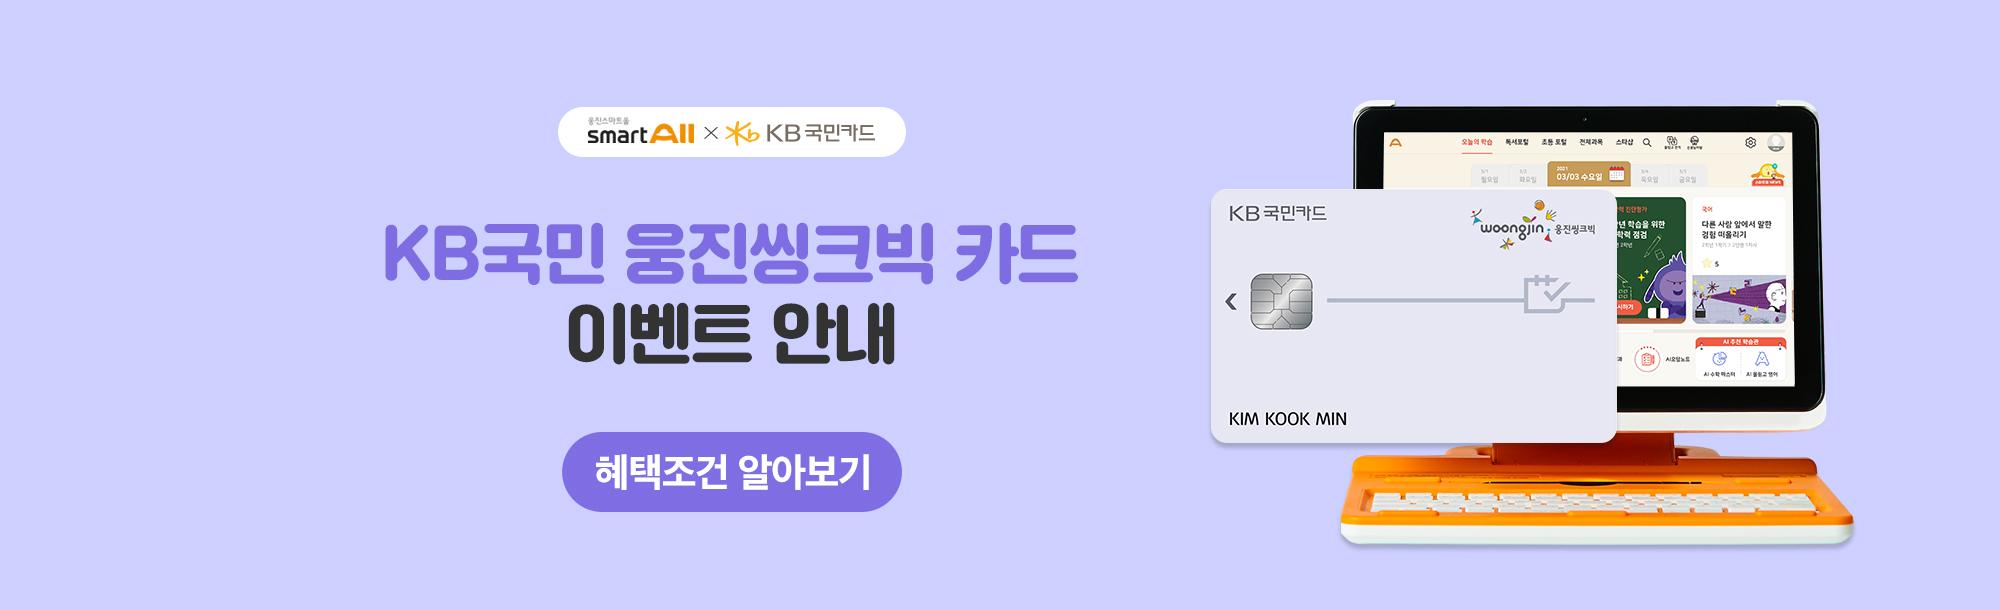 KB국민 웅진씽크빅 카드 이벤트 안내